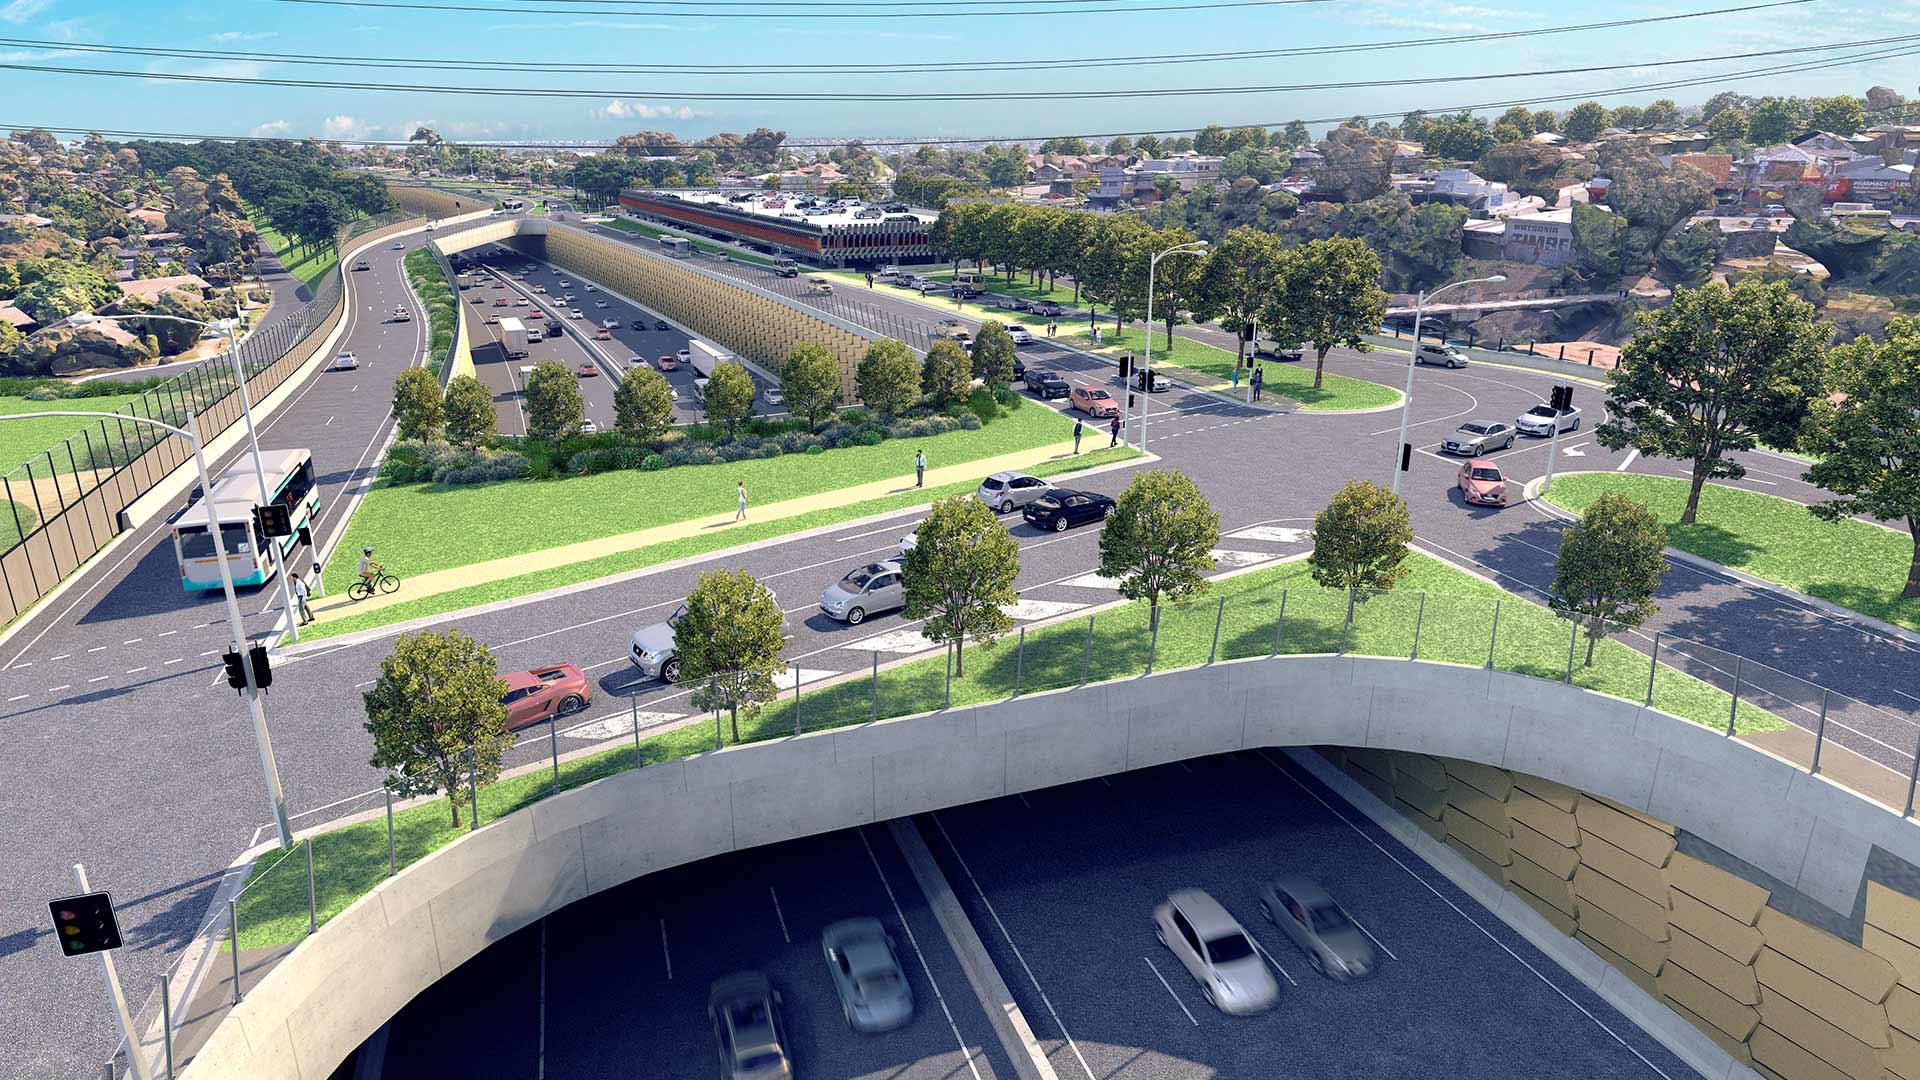 Artist impression of Elder Street green bridge alternate design.